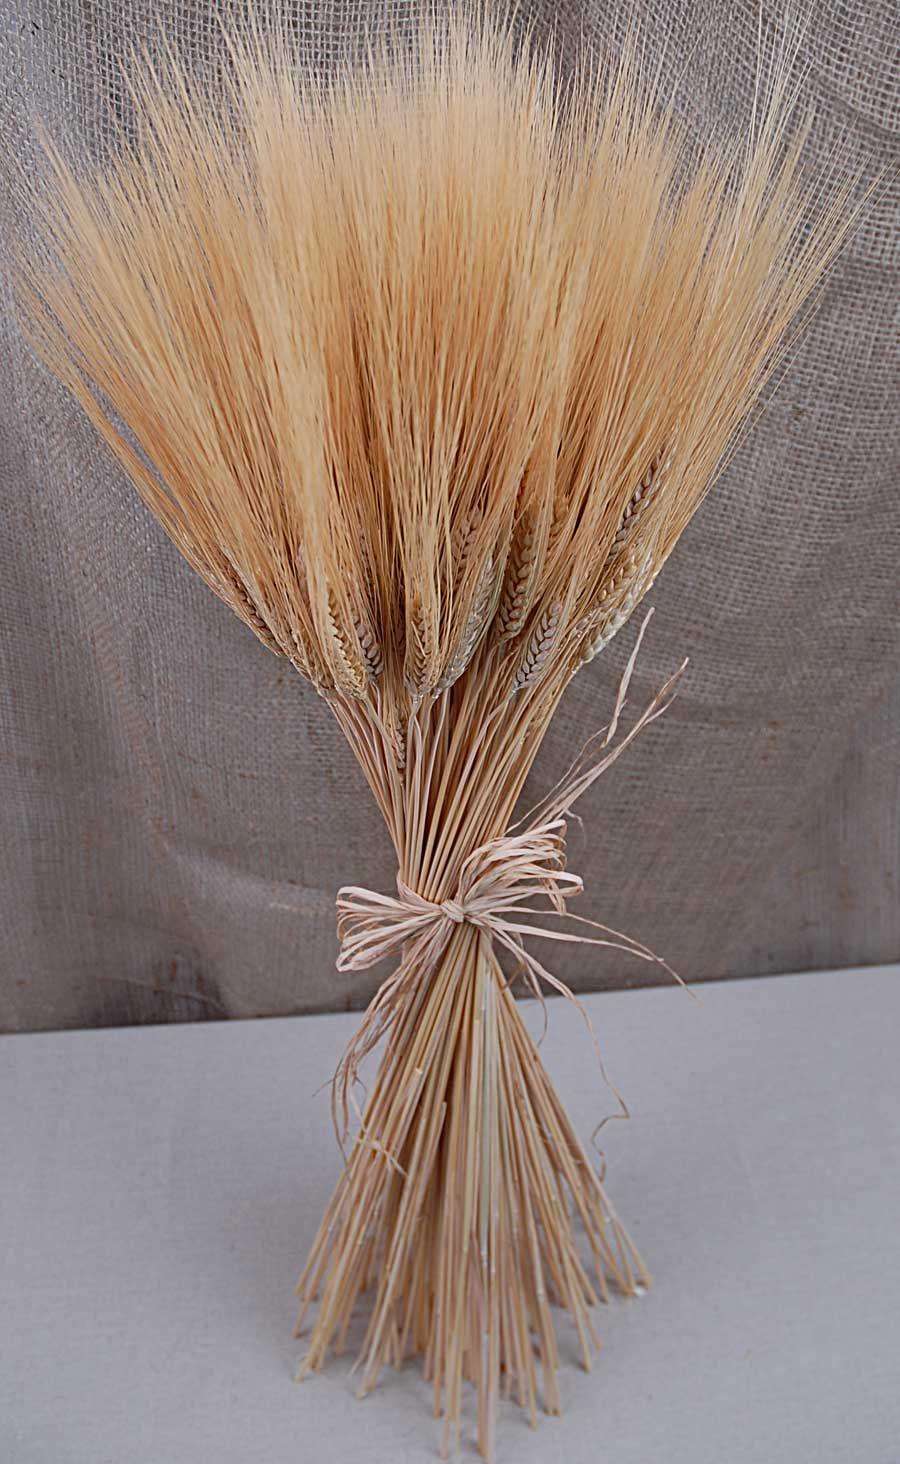 2013 10 22 3325 Edited Jpg 900 1464 Wheat Bundle Wheat Decorations Fall Decor Dollar Tree